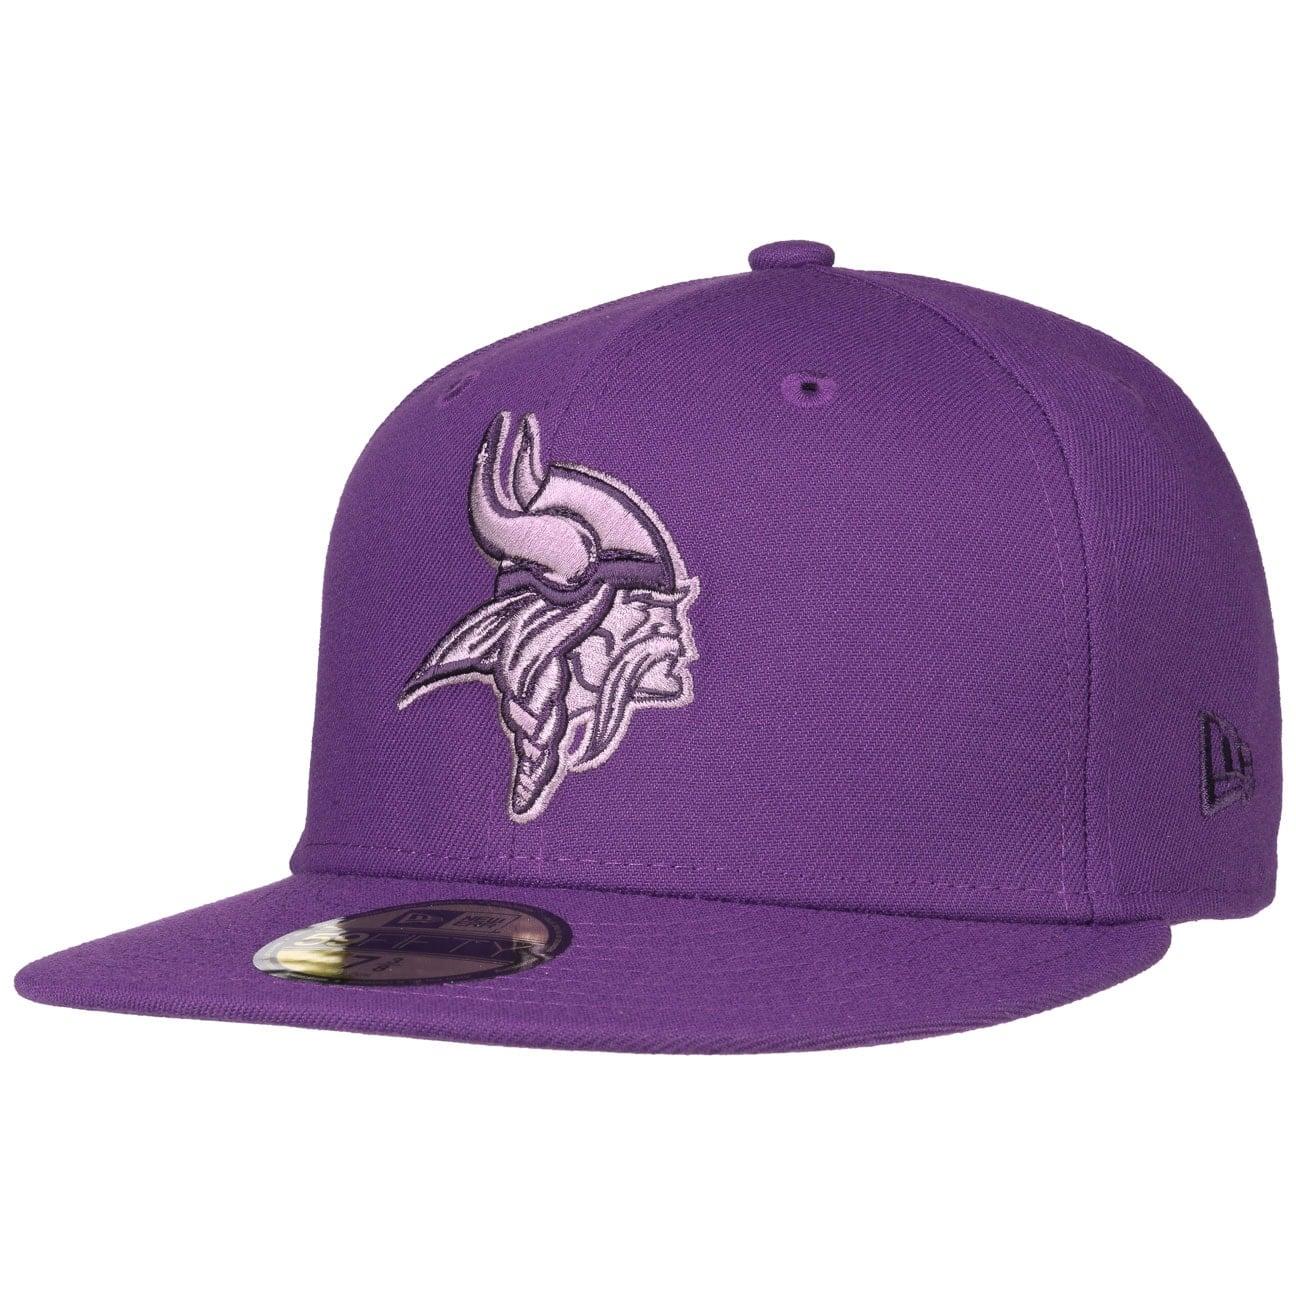 59fifty-pop-vikings-cap-by-new-era-basecap